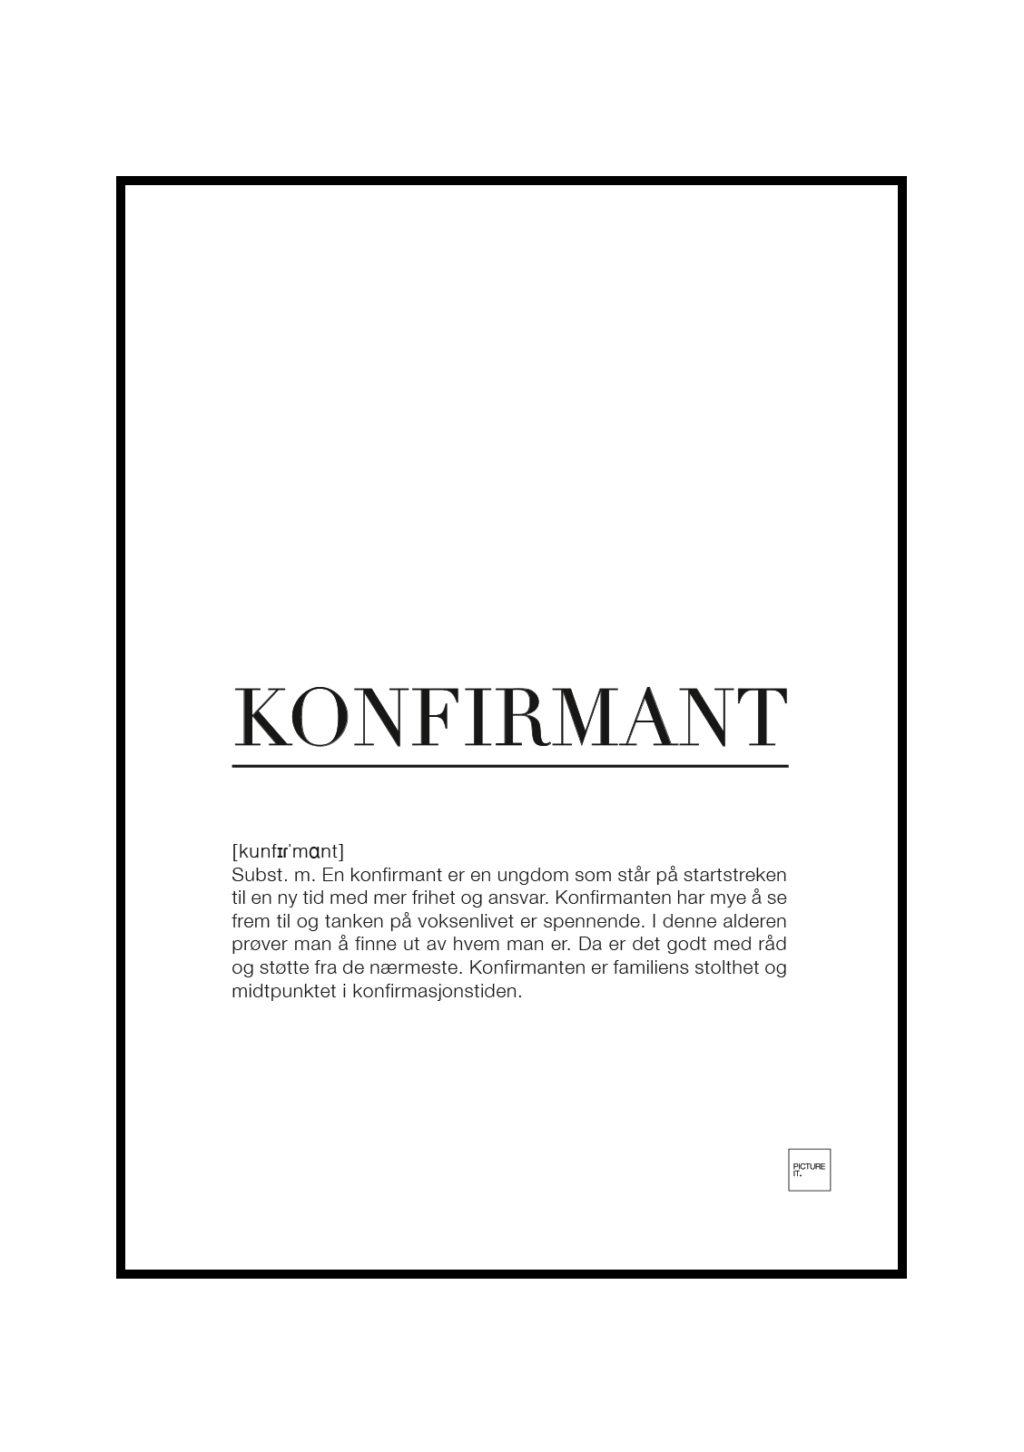 KONFIRMANT